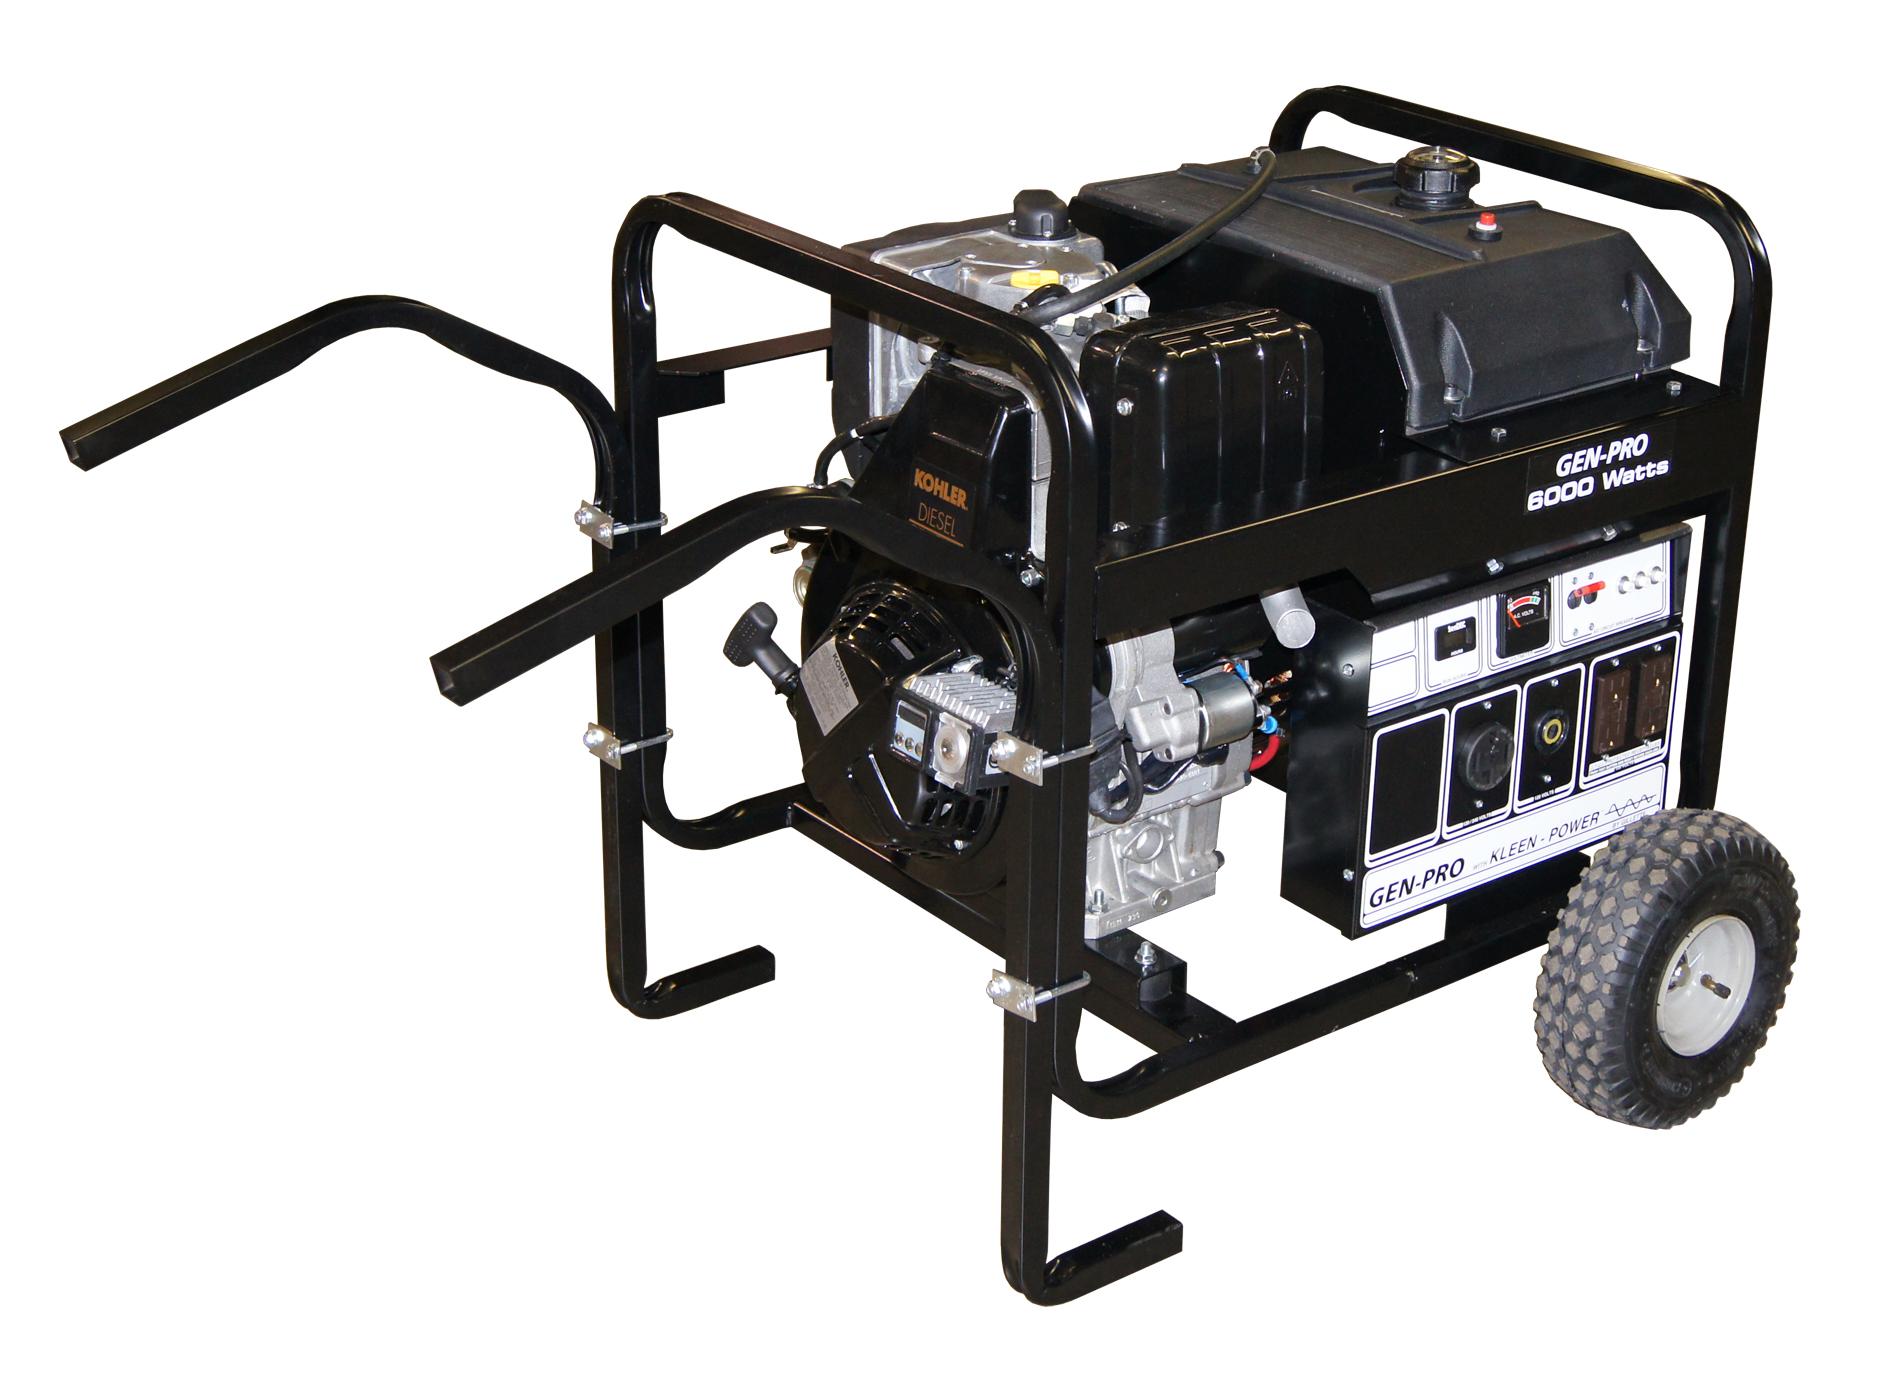 GPED 65EK GenPro Portable Generator 6000W 120 240Vac Kohler